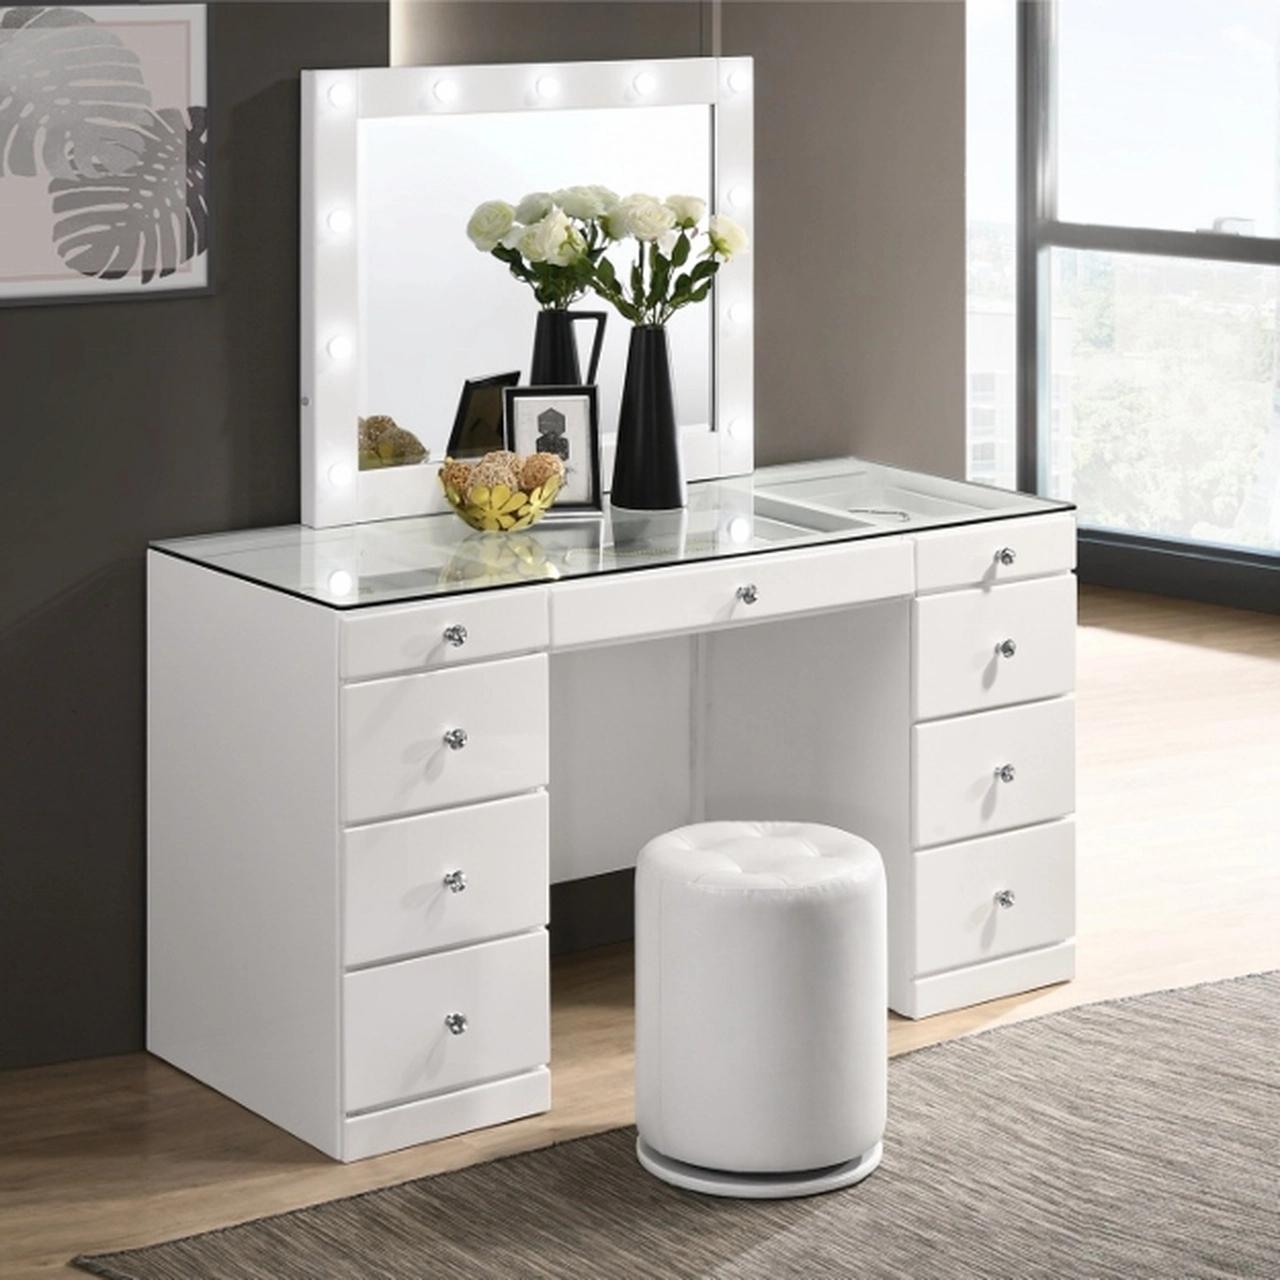 B4850WHSET Avery Vanity Desk Set White